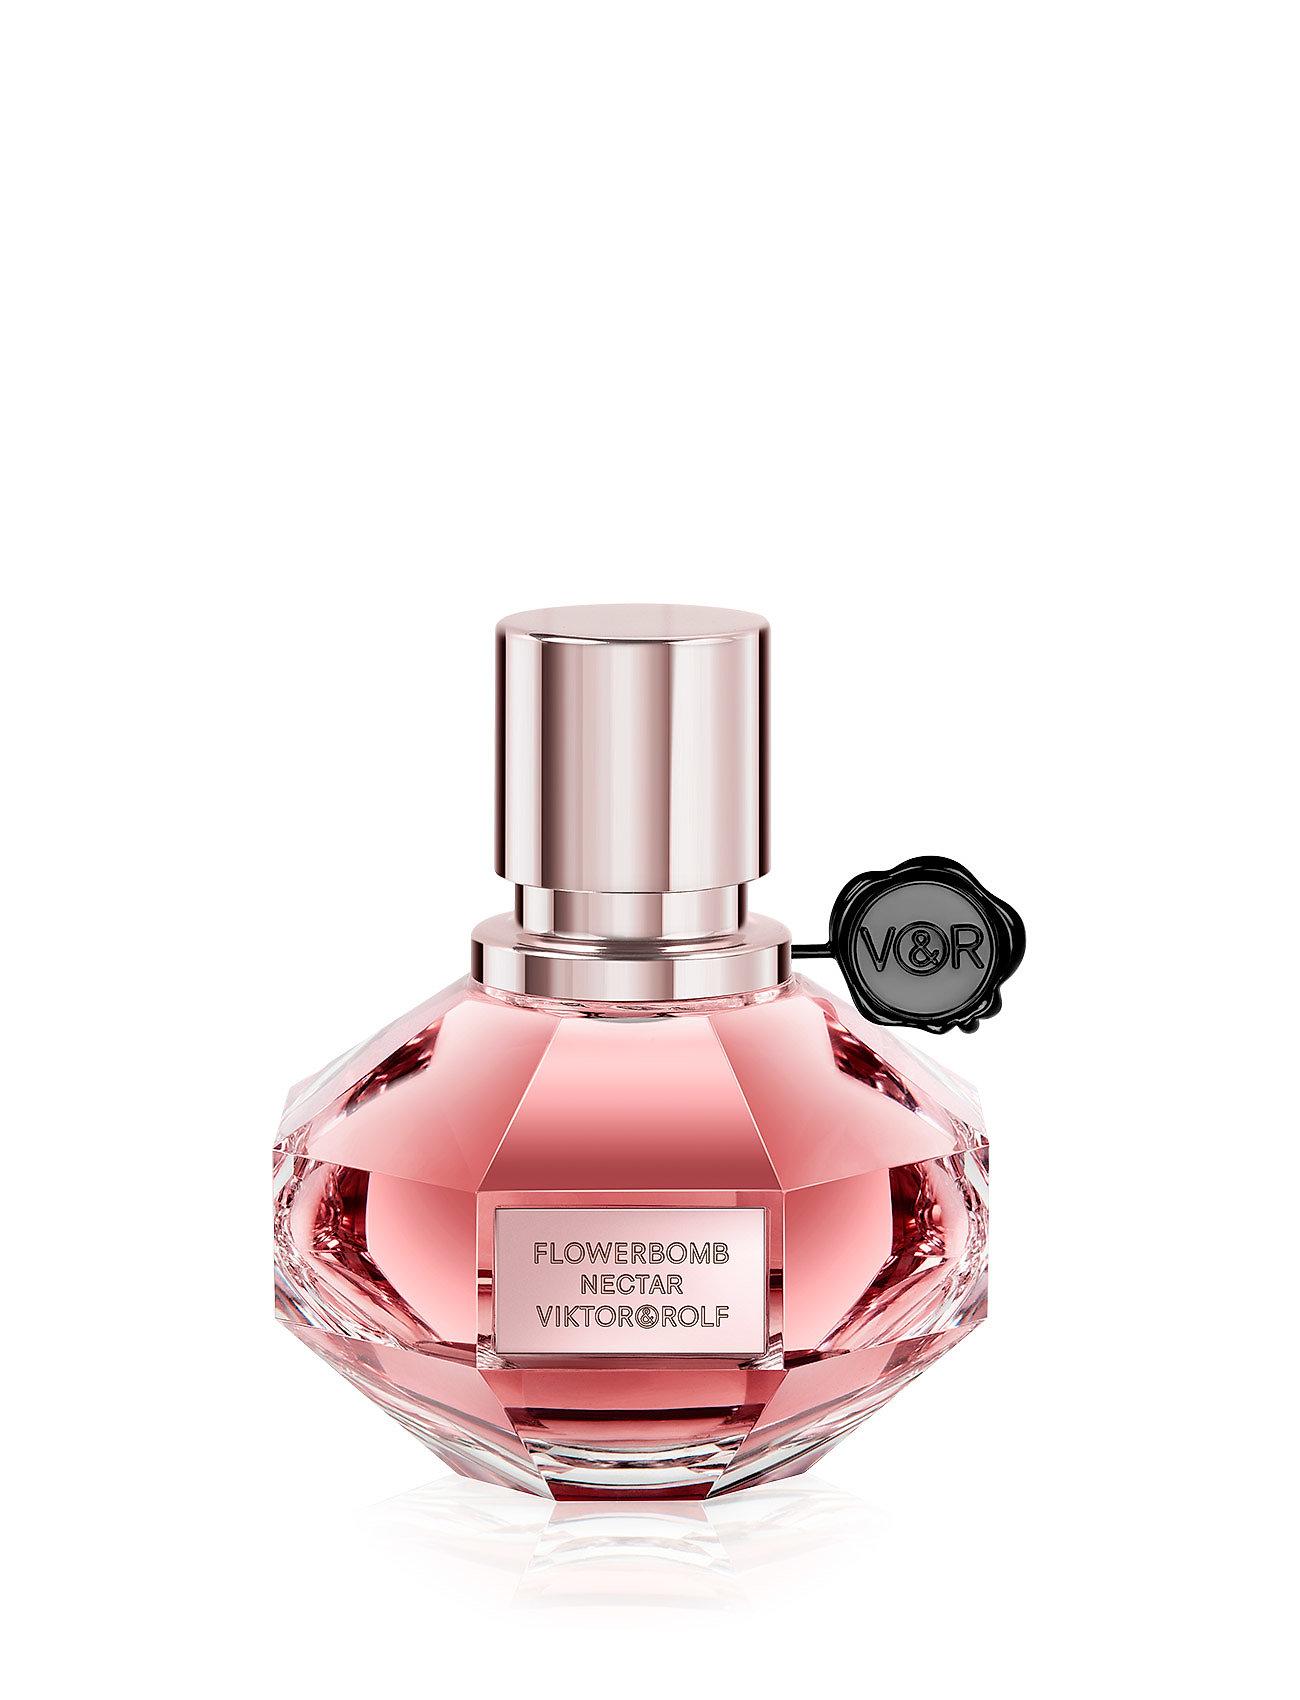 Flowerbomb Nectar Eau De Parfume 30 Ml - Viktor & Rolf